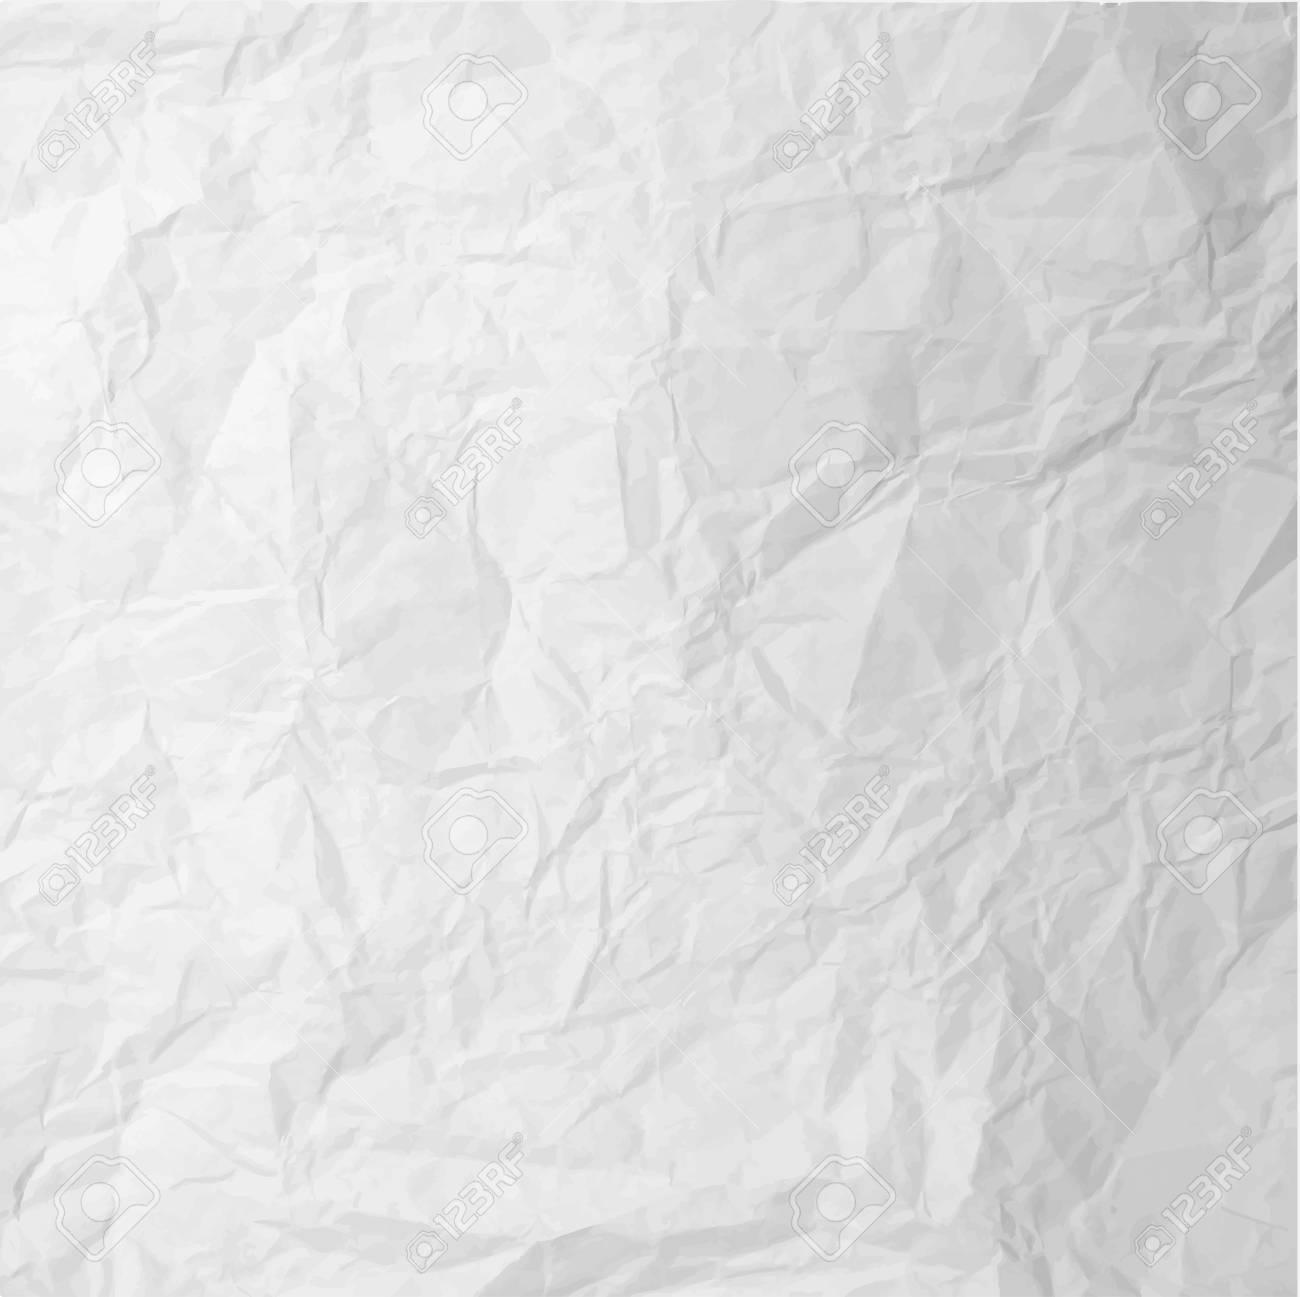 paper texture - Parfu kaptanband co